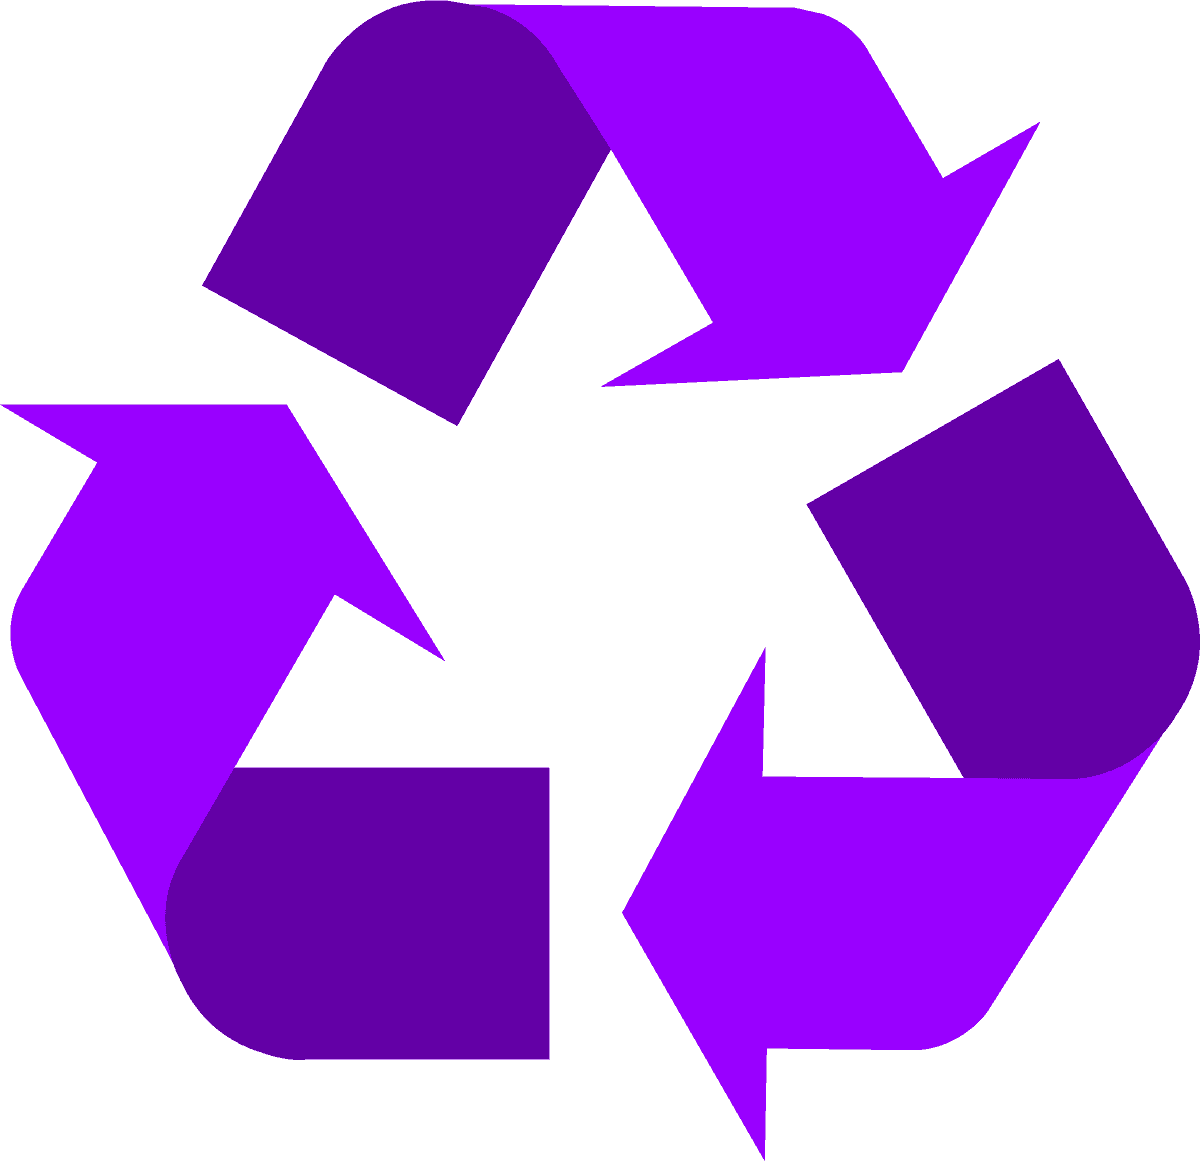 recycling-symbol-icon-twotone-purple